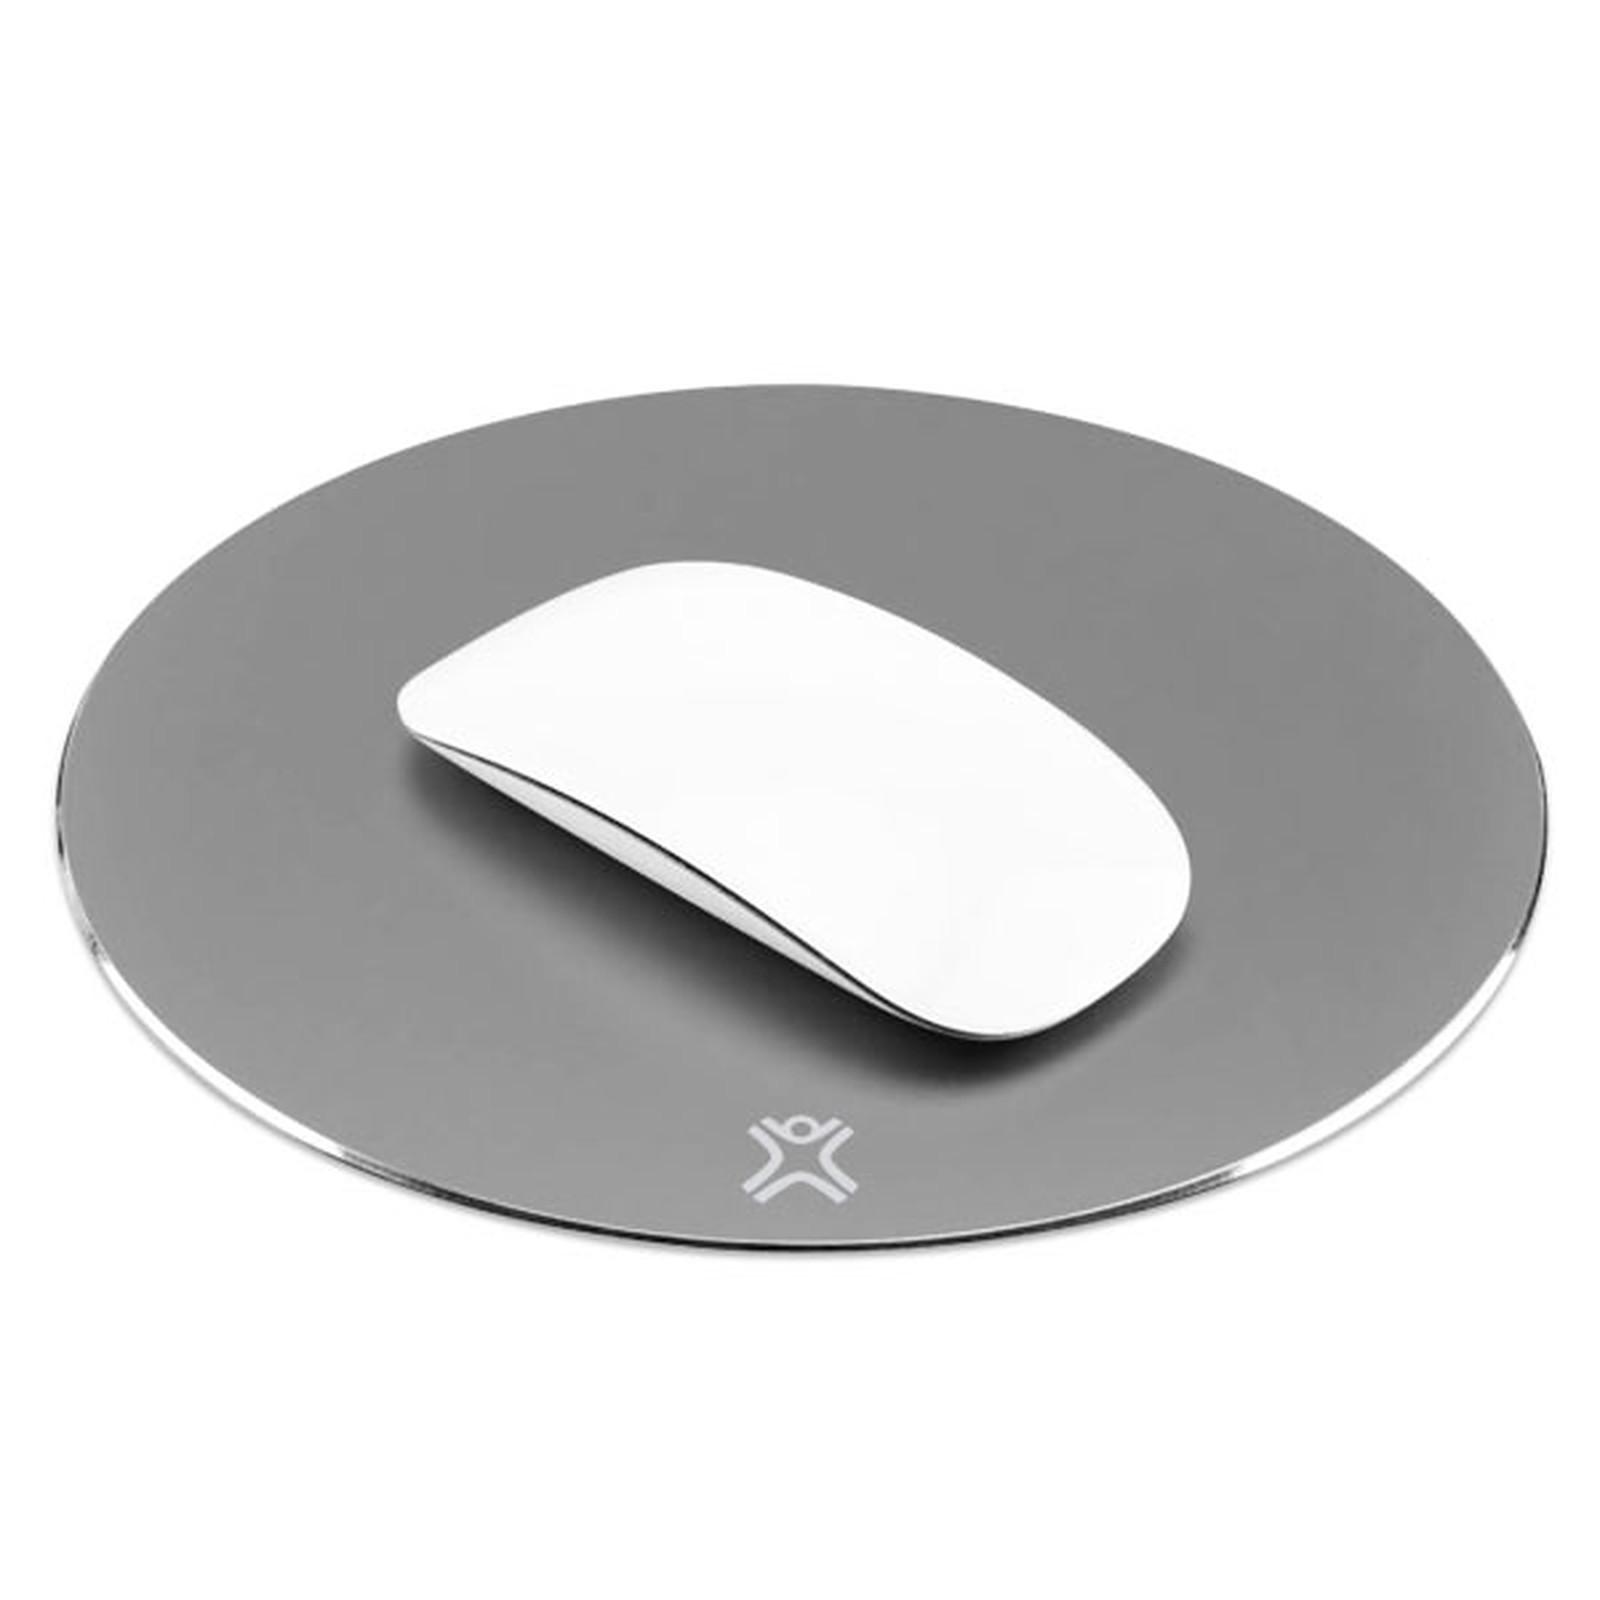 XtremeMac Aluminium Mouse Pad (Gris)